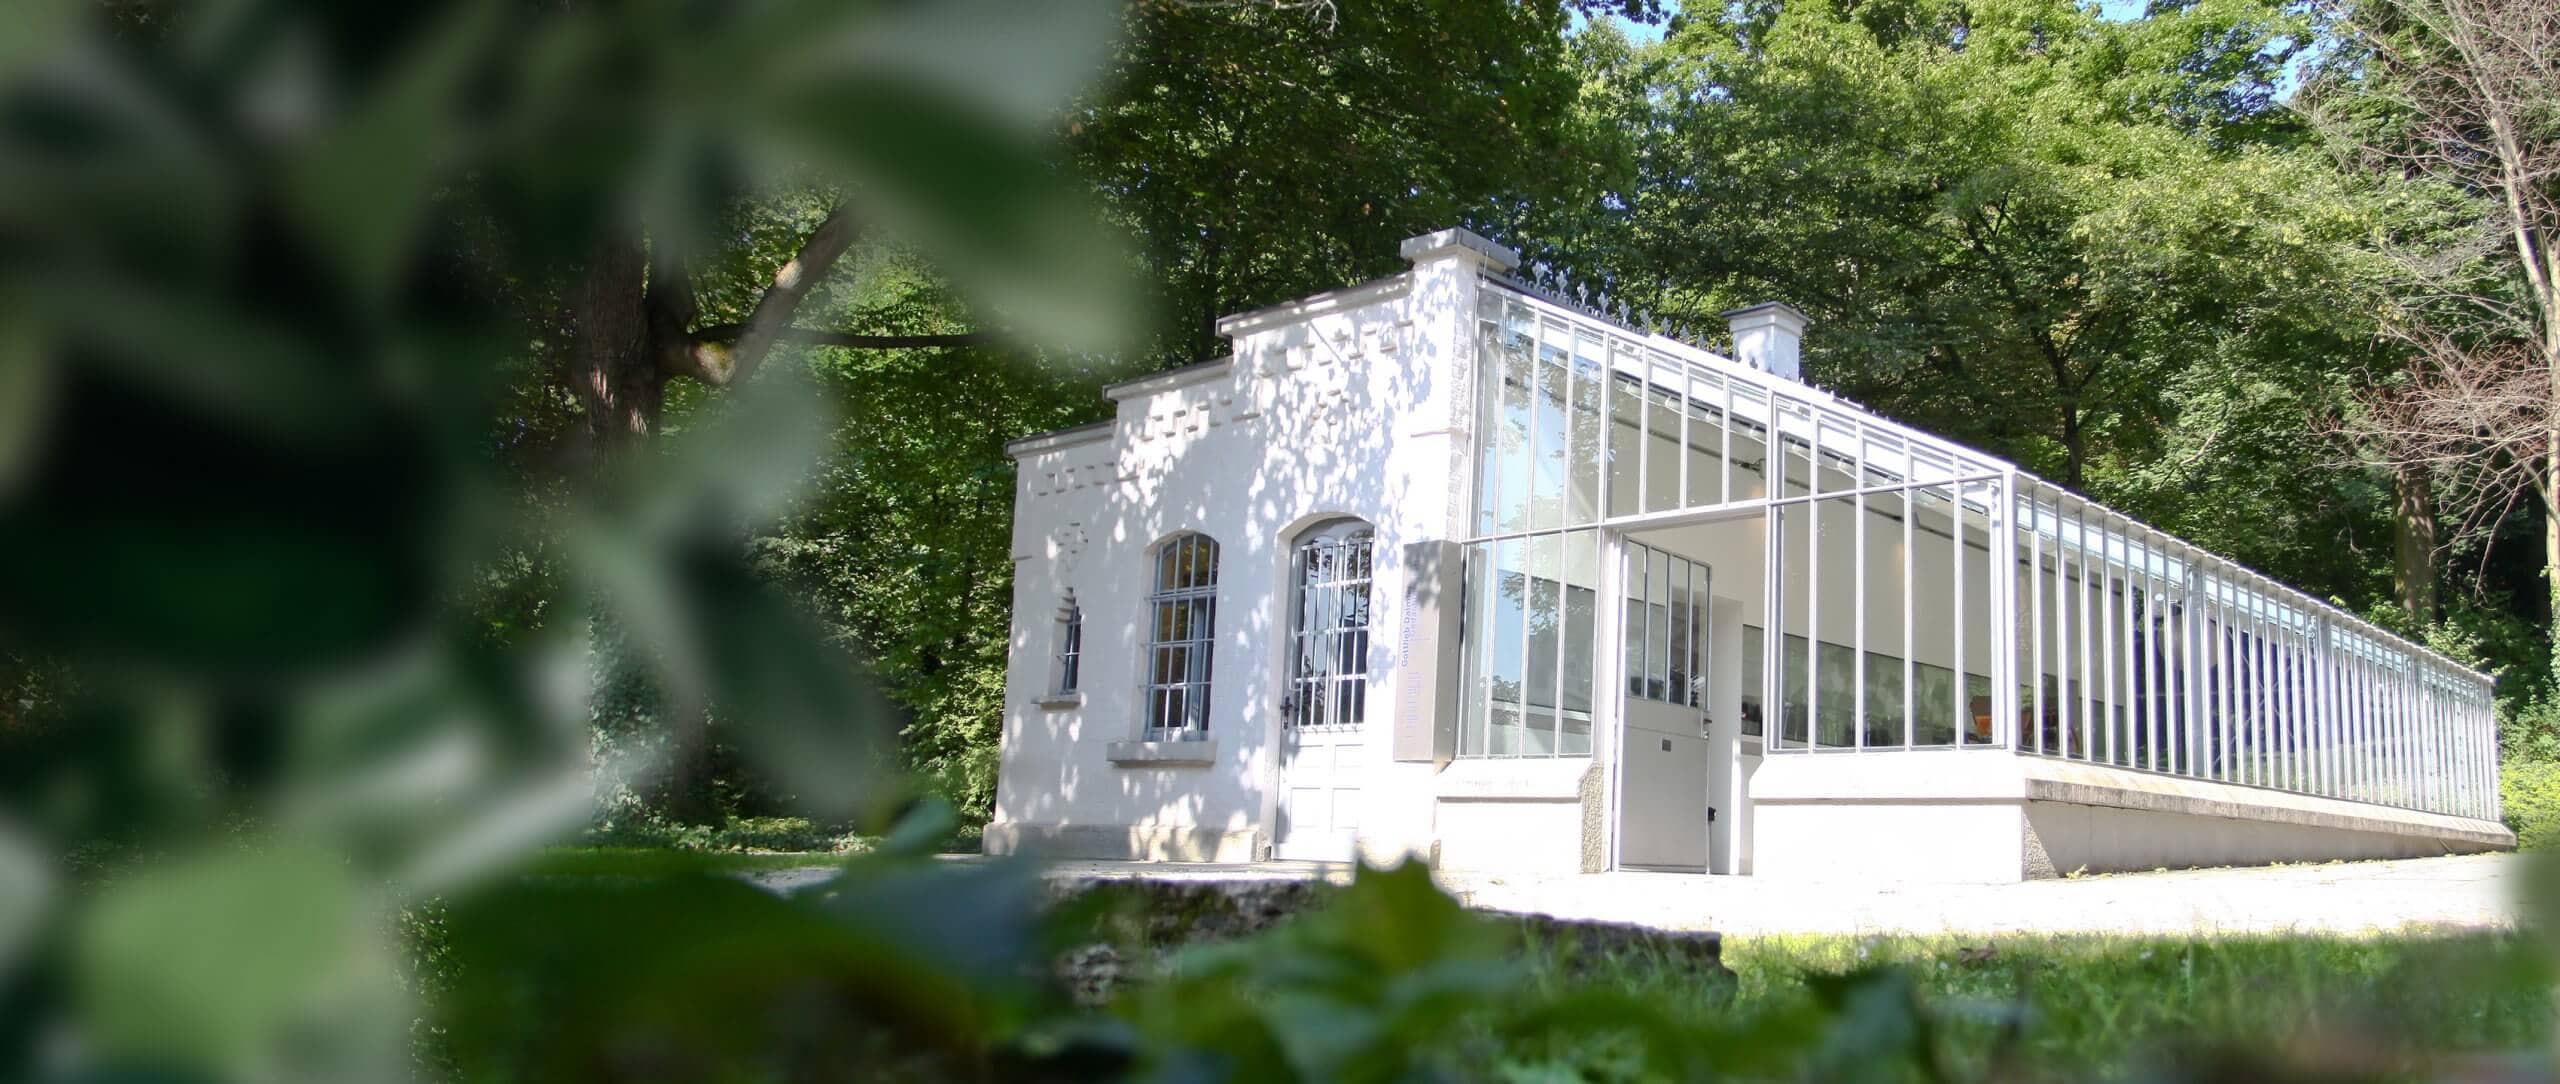 Gottlieb Daimler Memorial